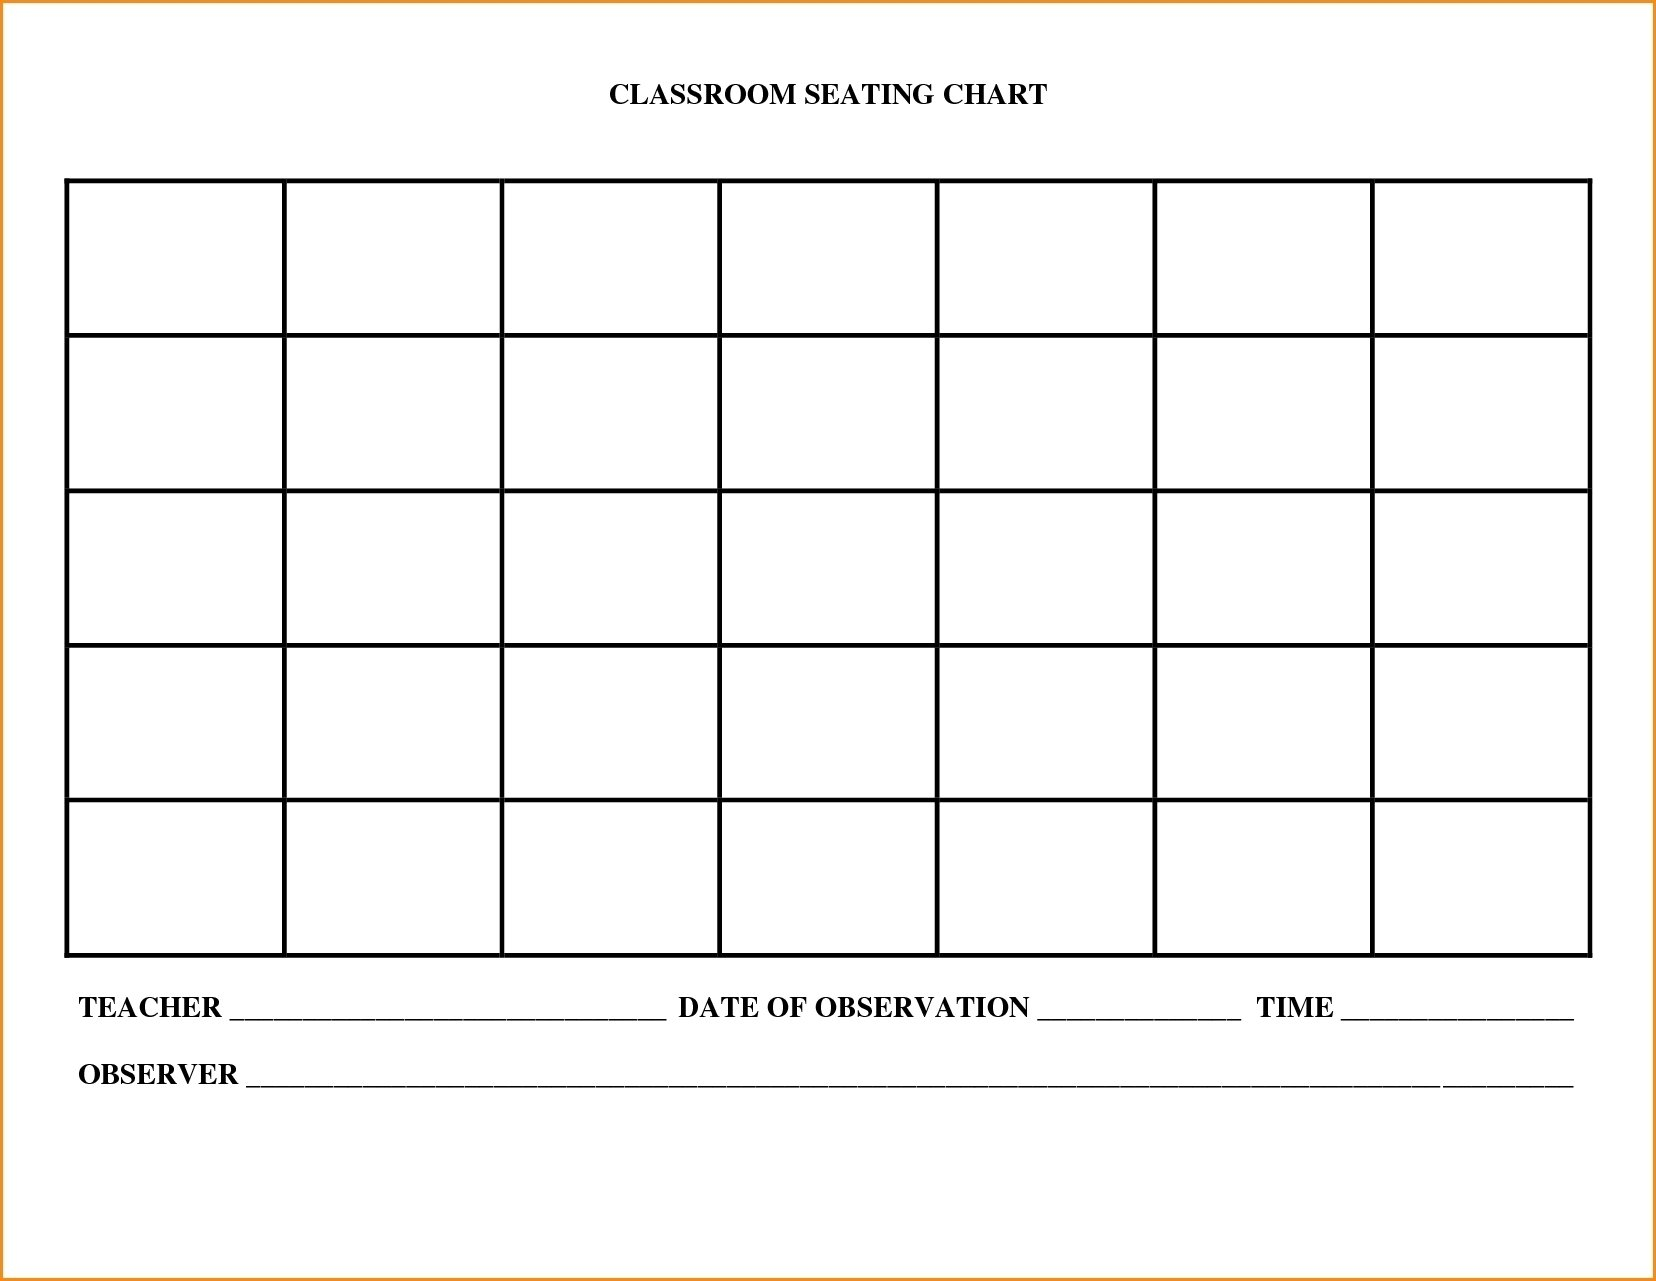 Blank Calendar To Fill In - Calendar Inspiration Design Blank Calendar To Fill